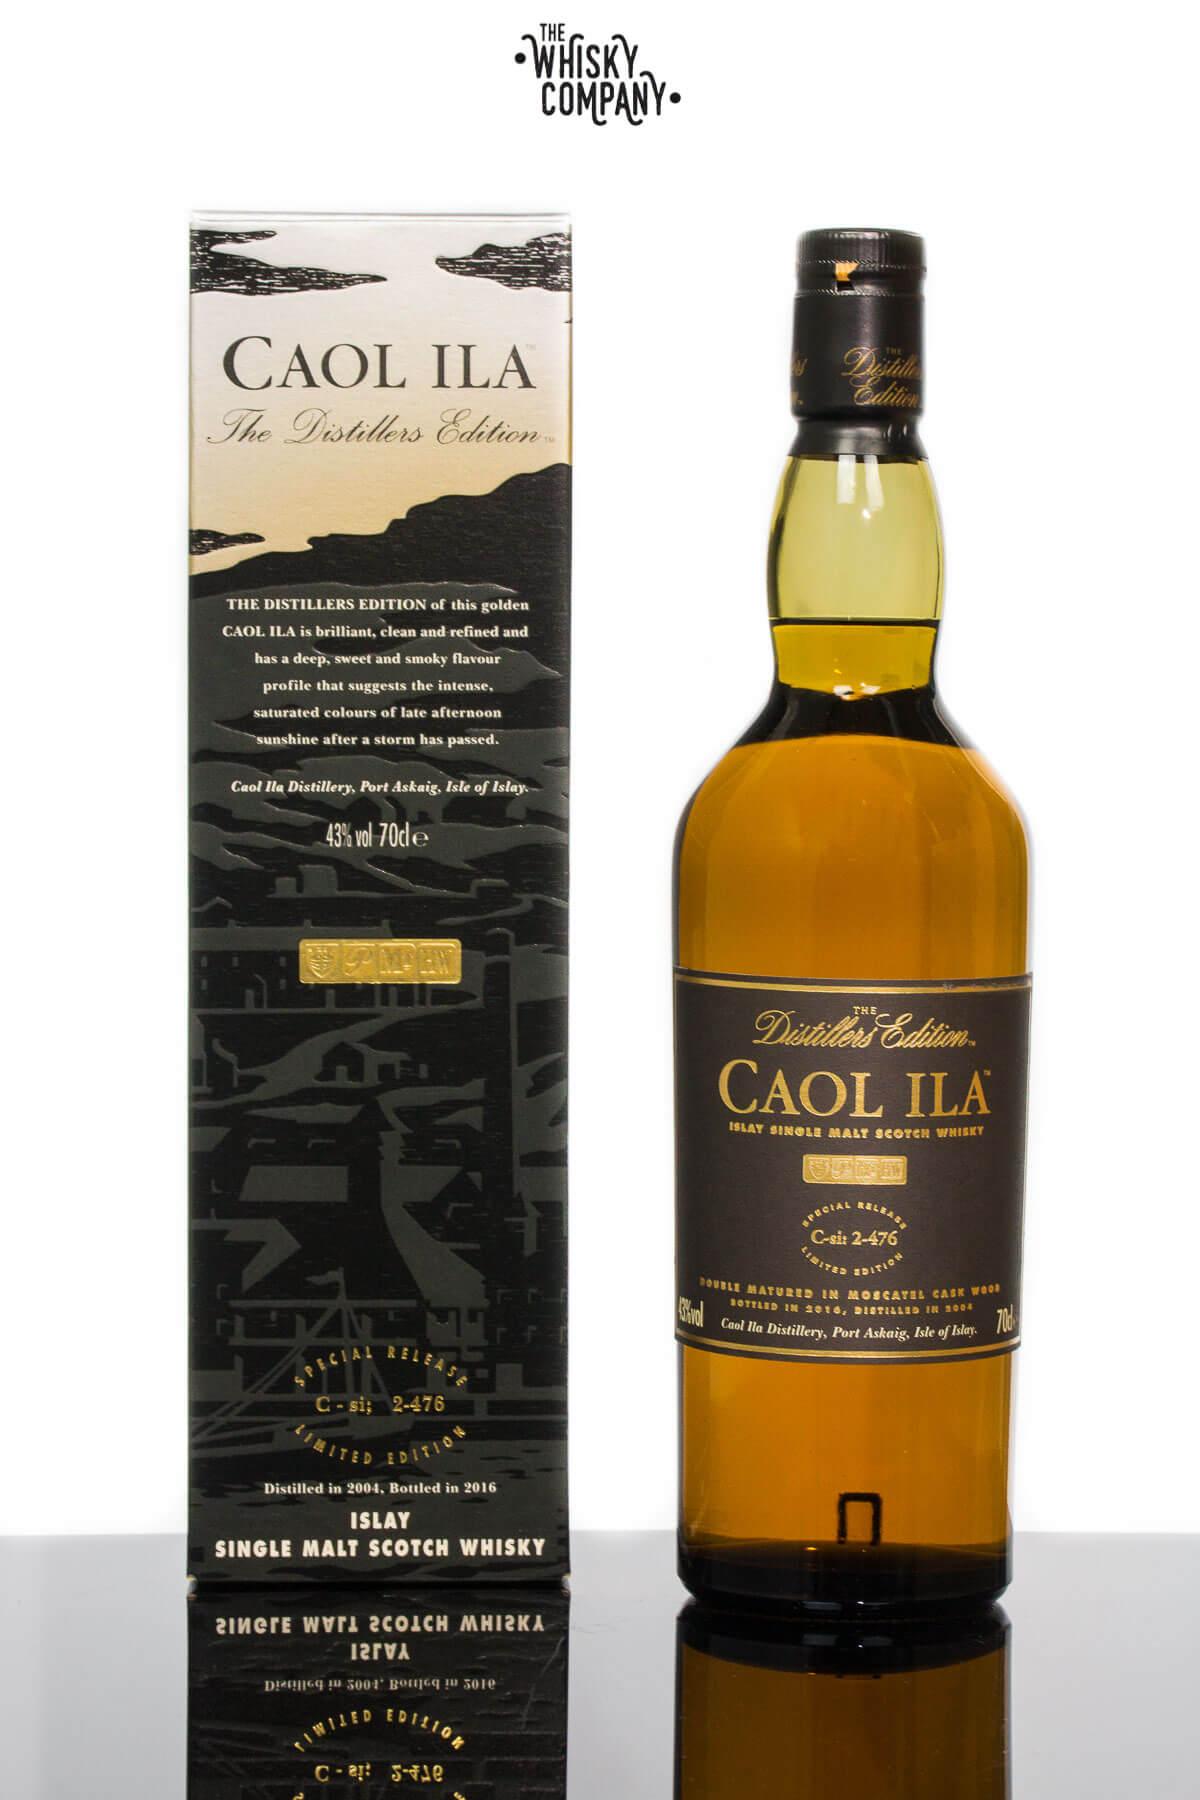 Caol Ila 2004 Distillers Edition Islay Single Malt Scotch Whisky (700ml)